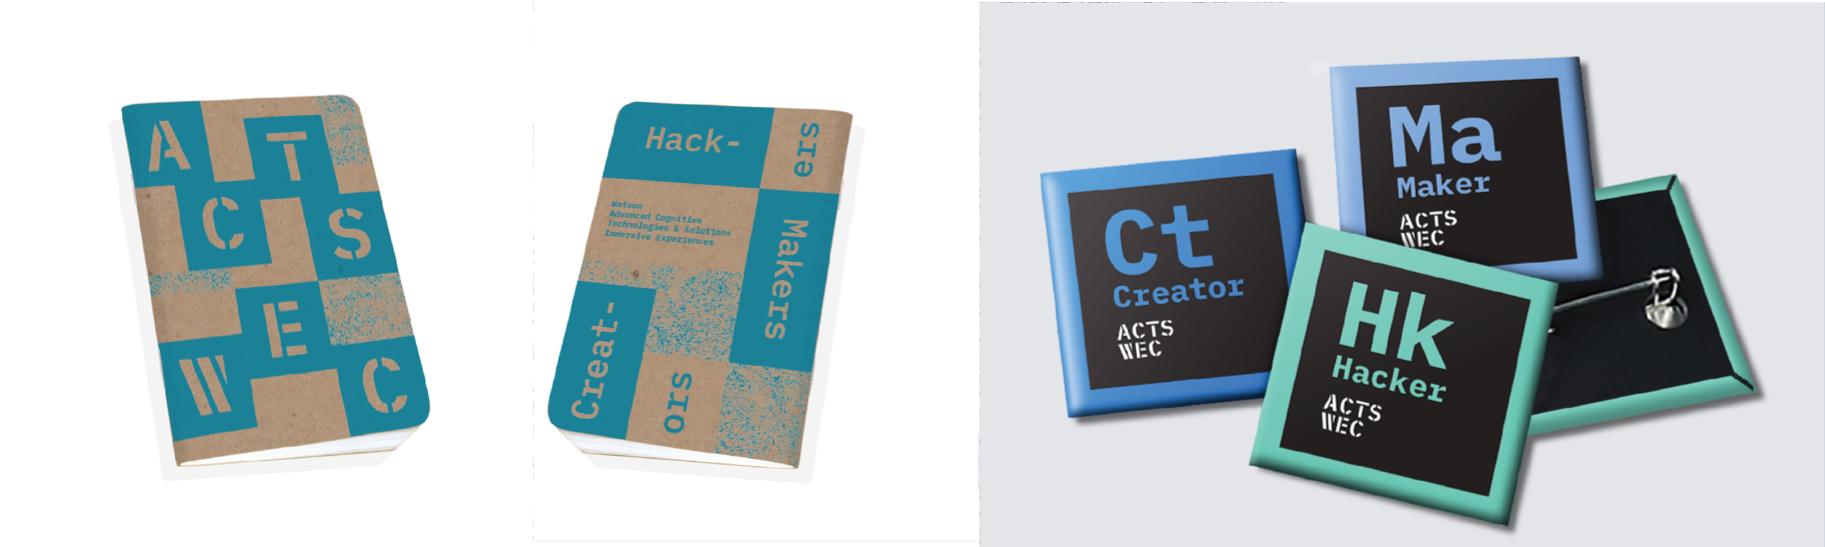 ACTS Merchandise